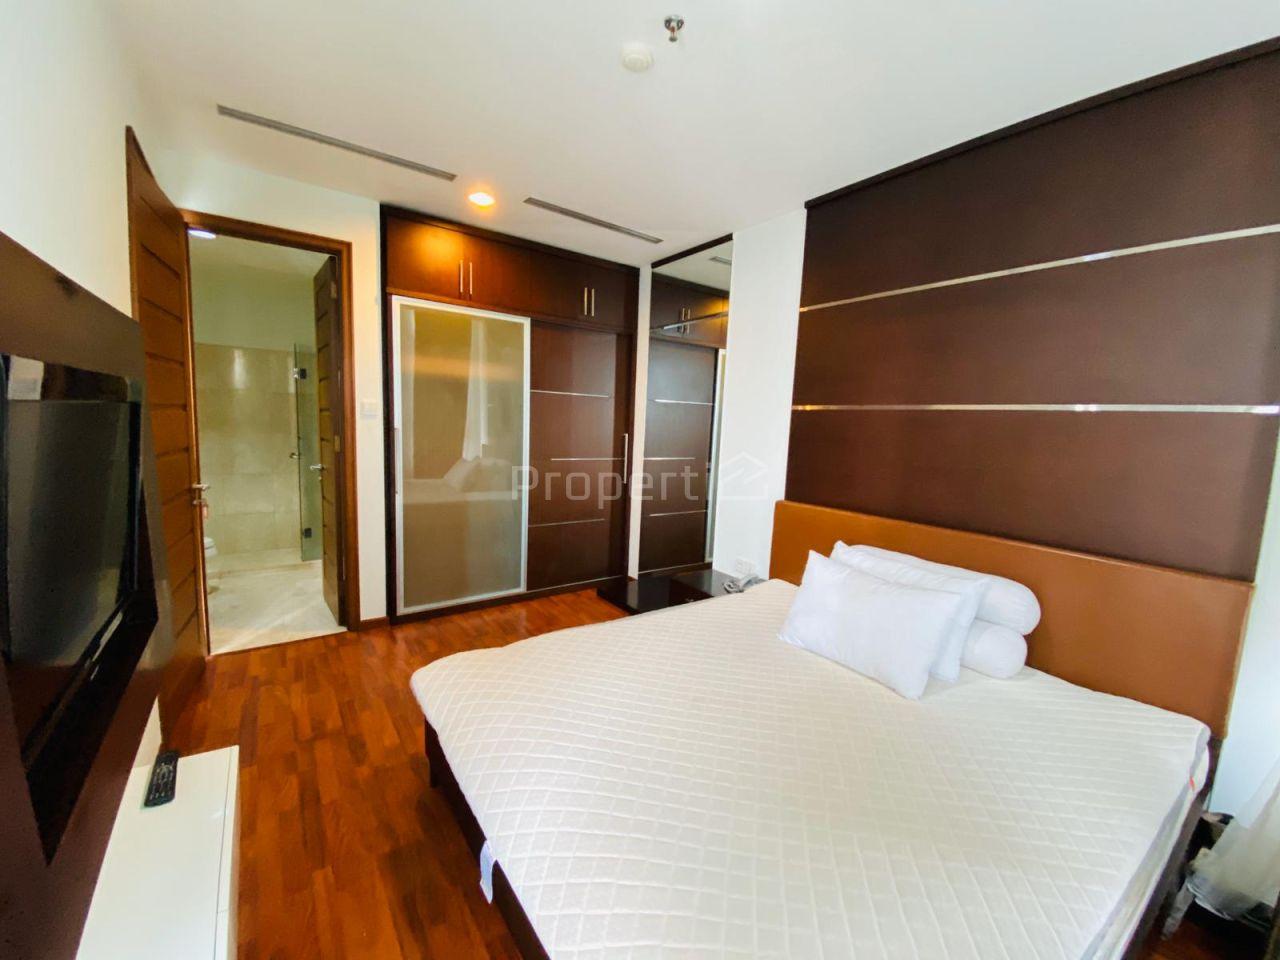 Unit 2 Kamar di Dago Butik Apartment, Lantai 10, Kota Bandung